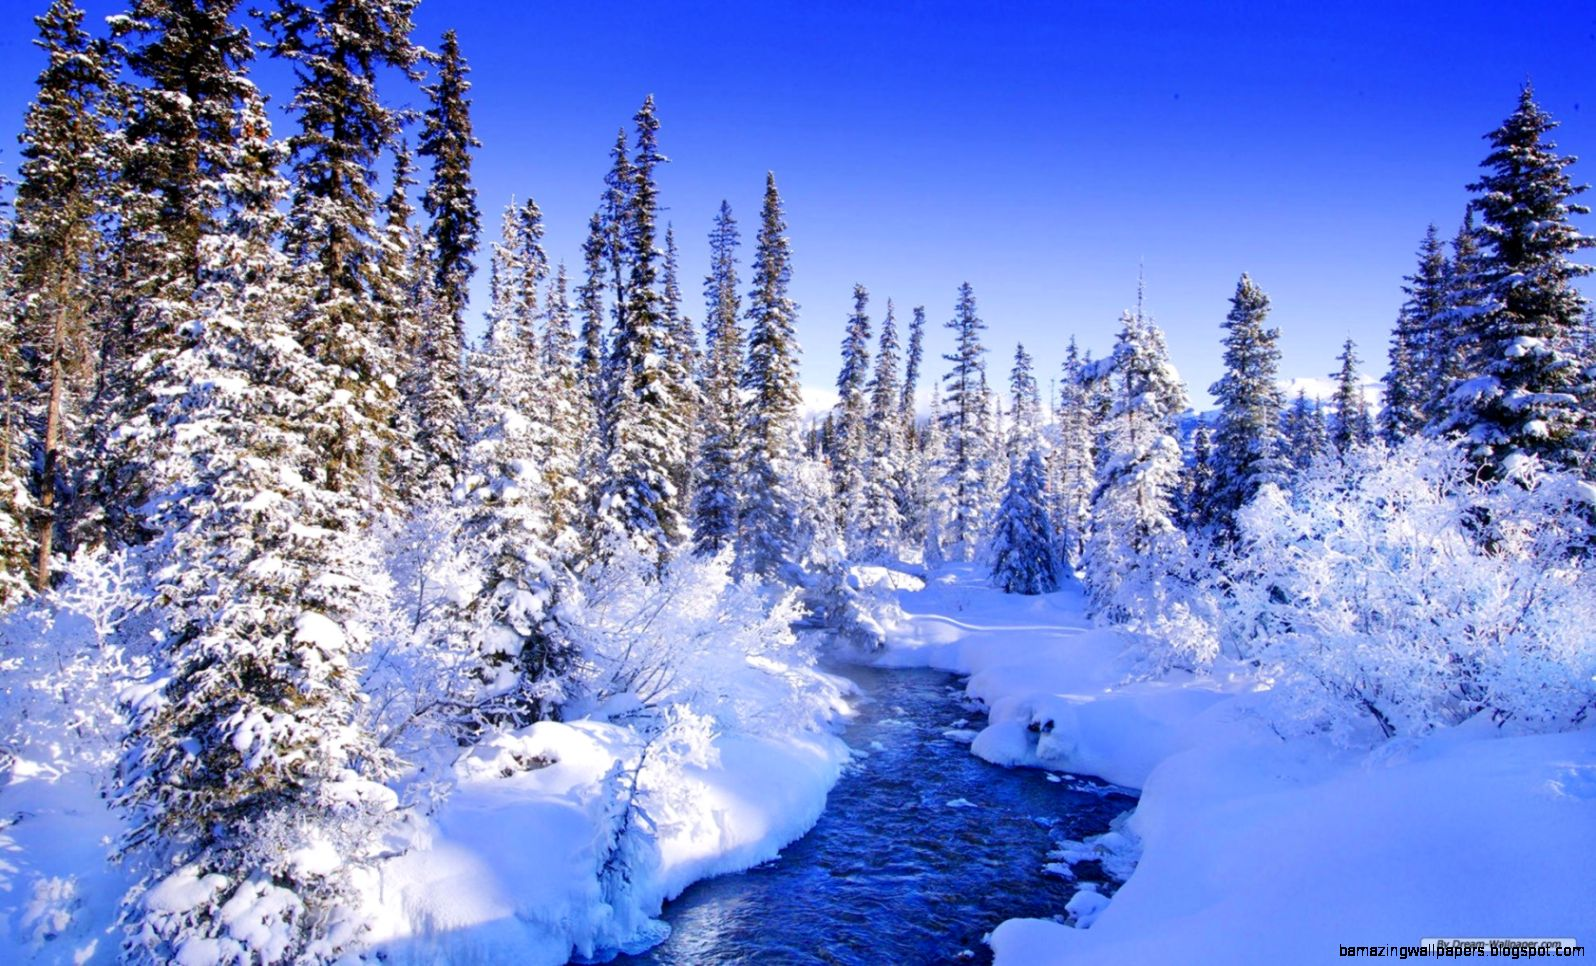 Hd Winter Nature Wallpapers   wallpaper